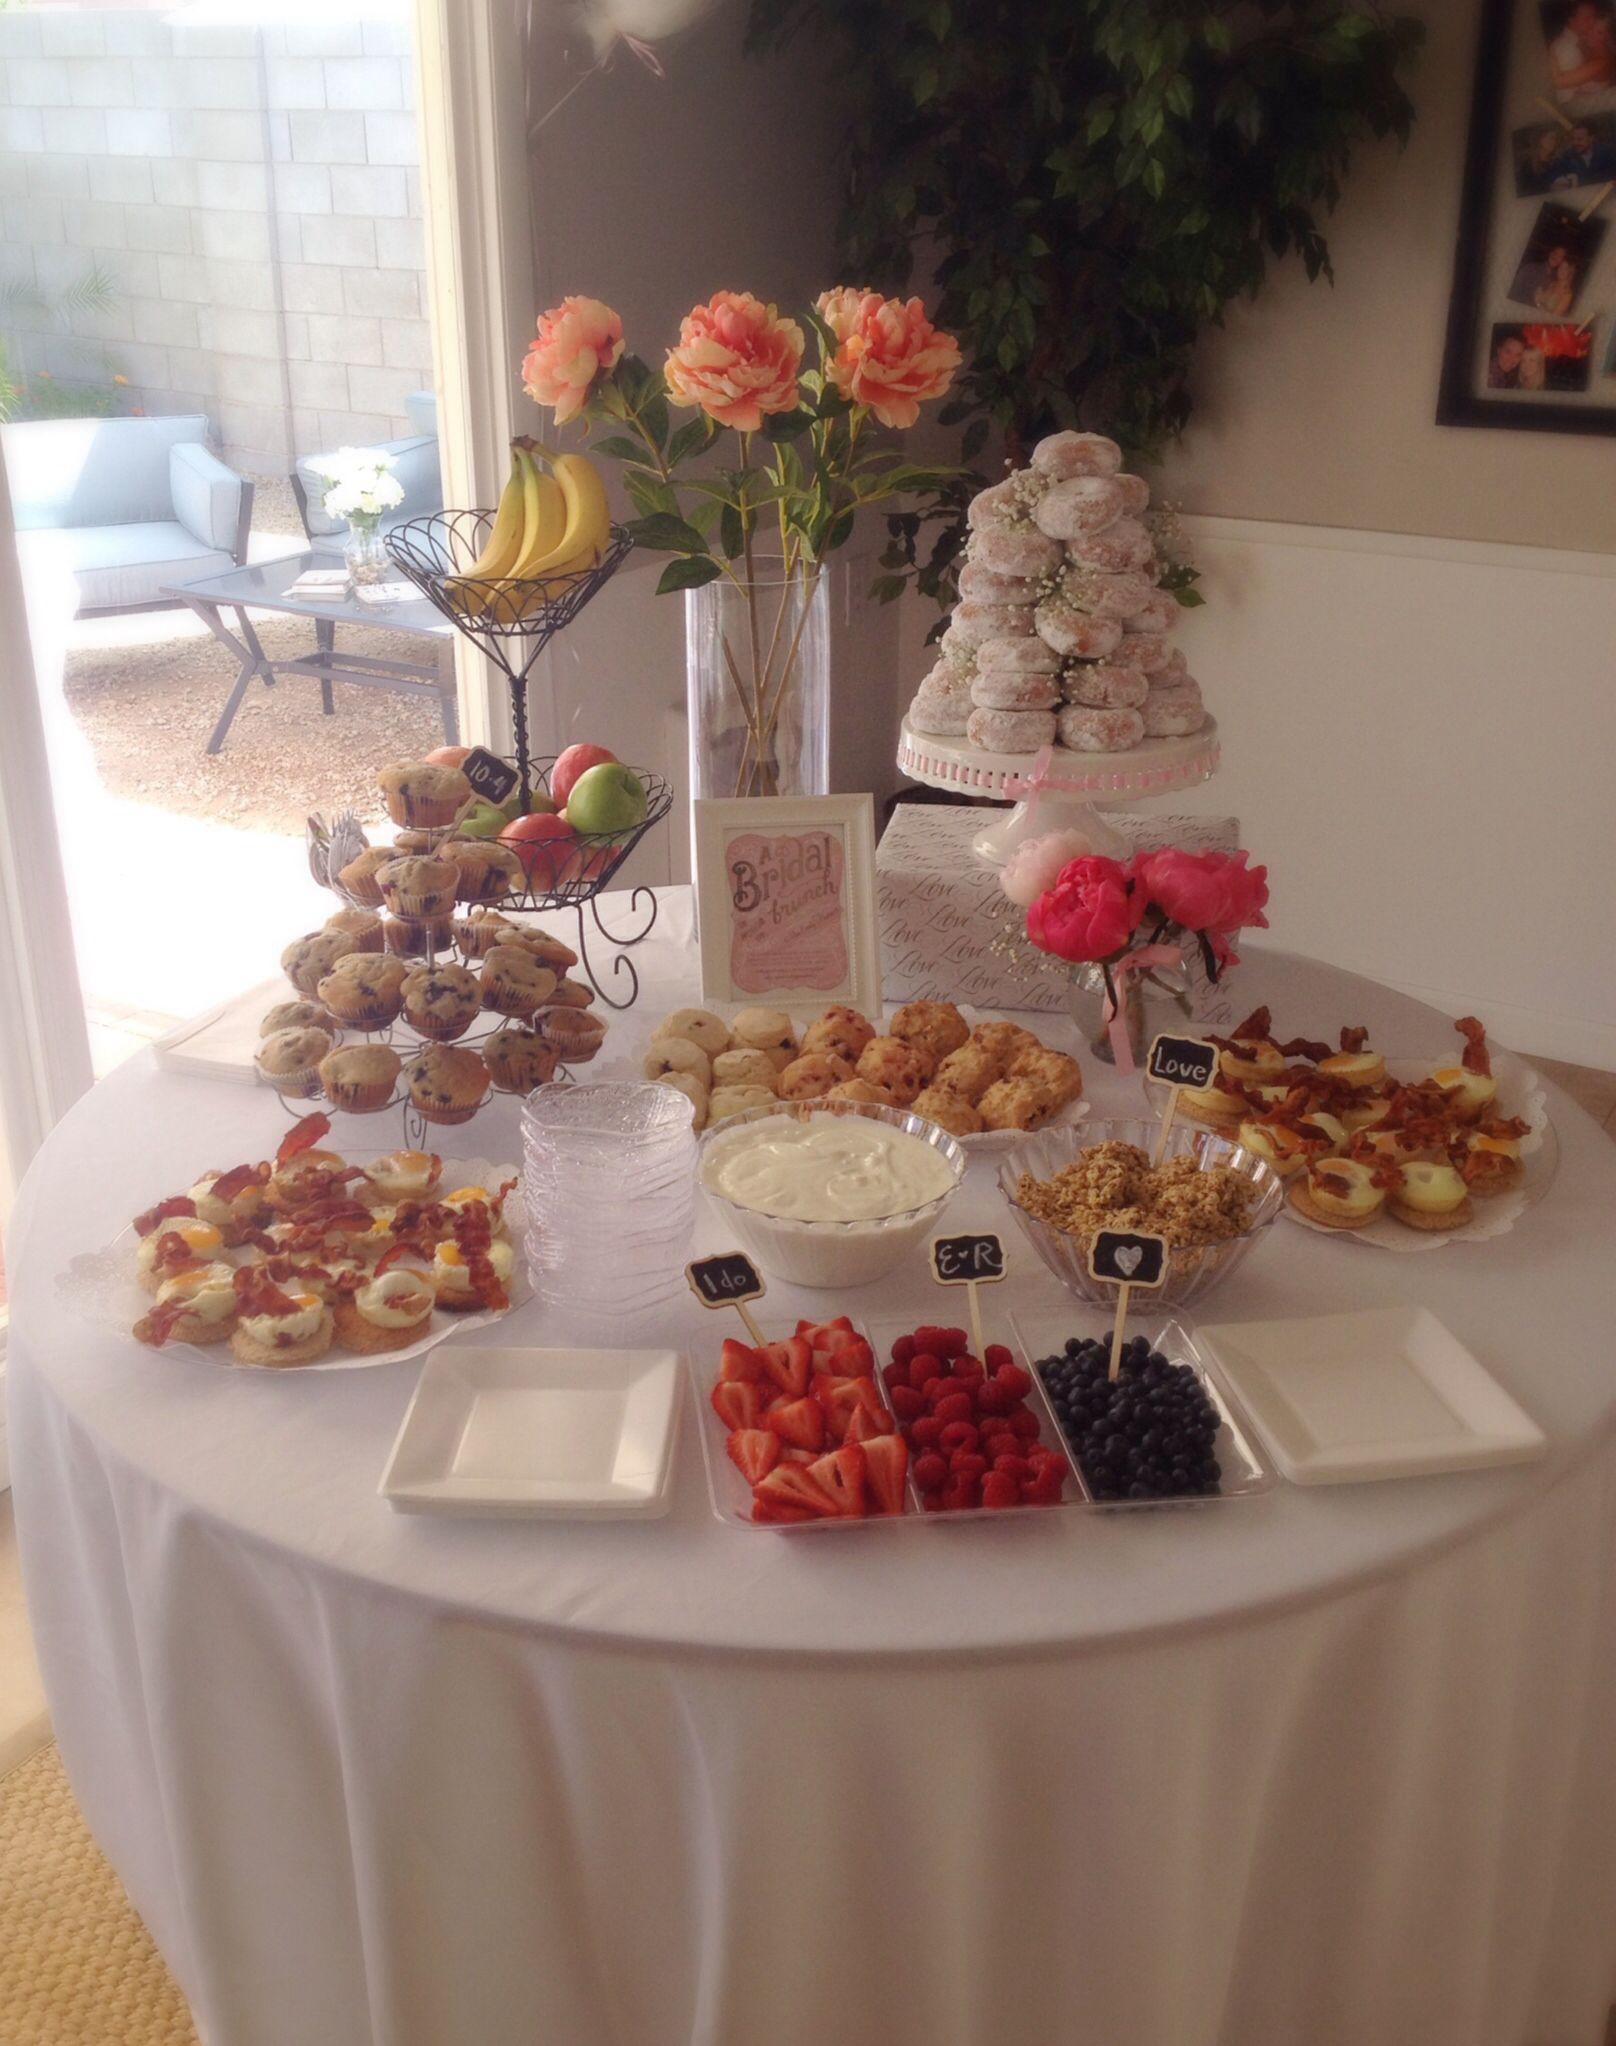 bridal shower brunch food yogurt bar scones muffins and egg sandwiches